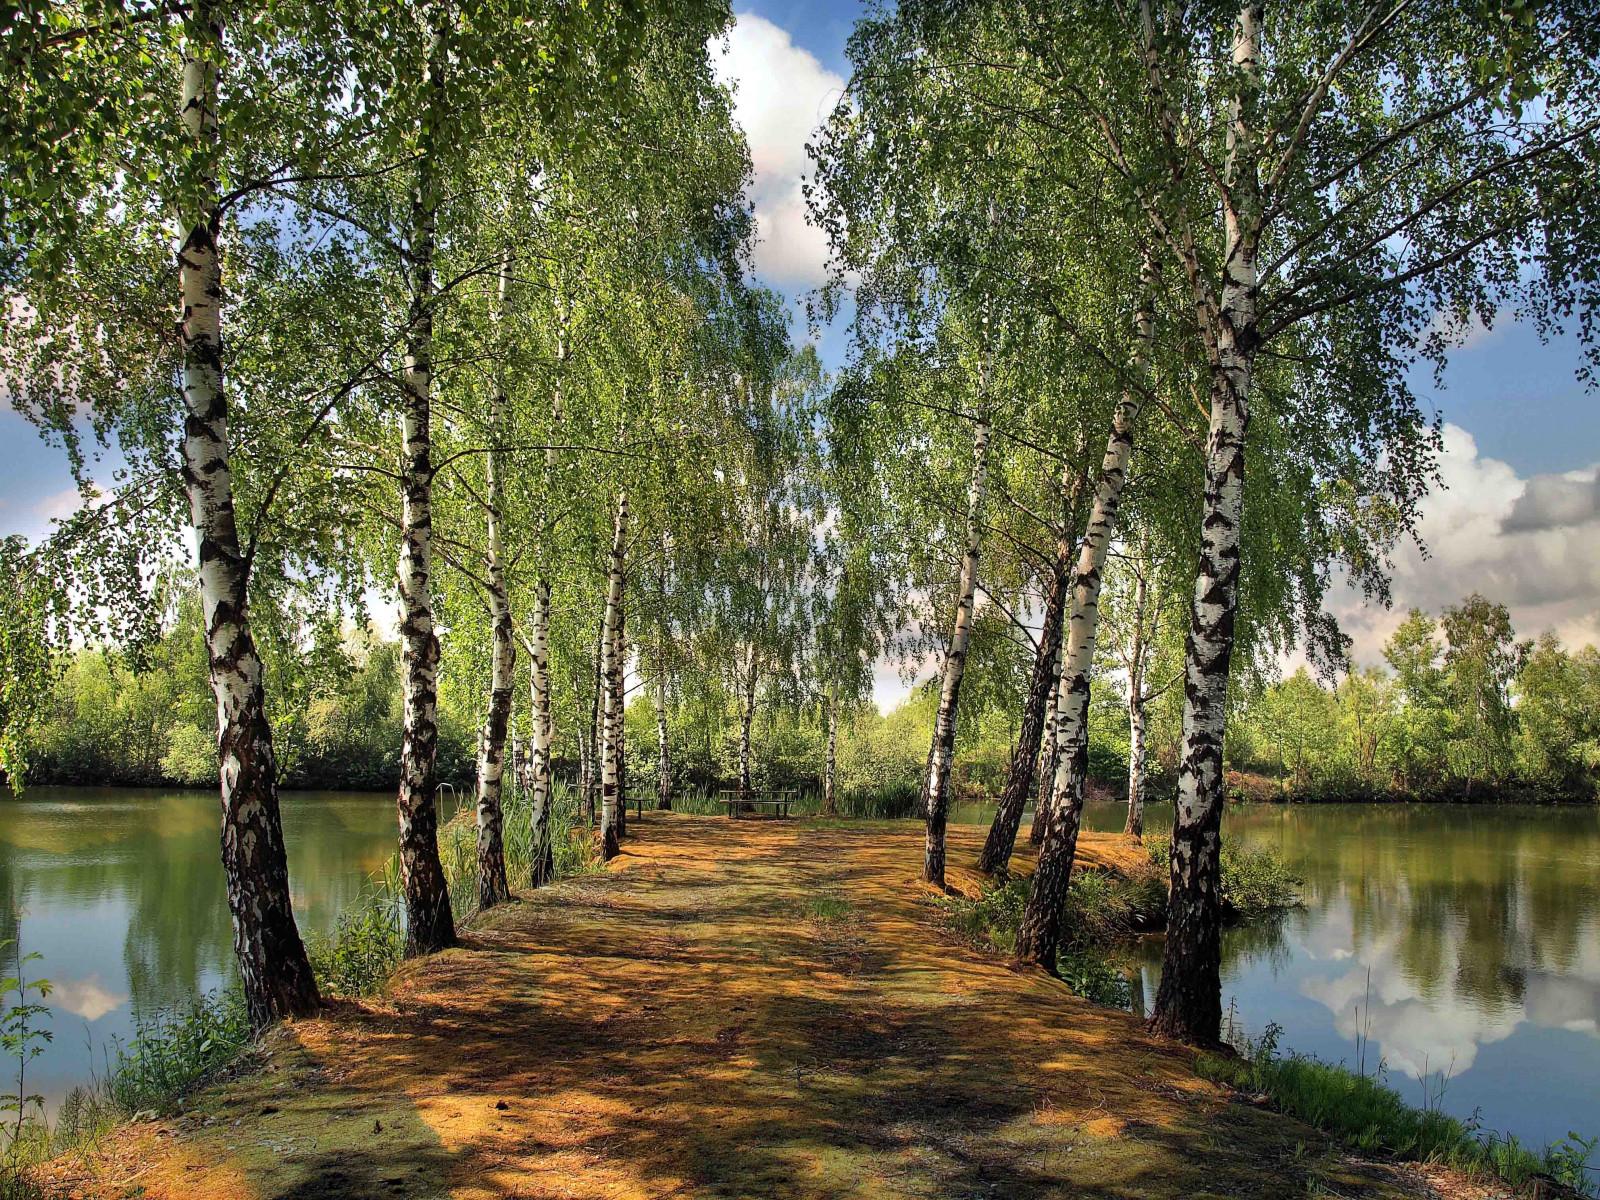 Wallpaper : summer, pond, park, birch, landscape 4032x3024 ...